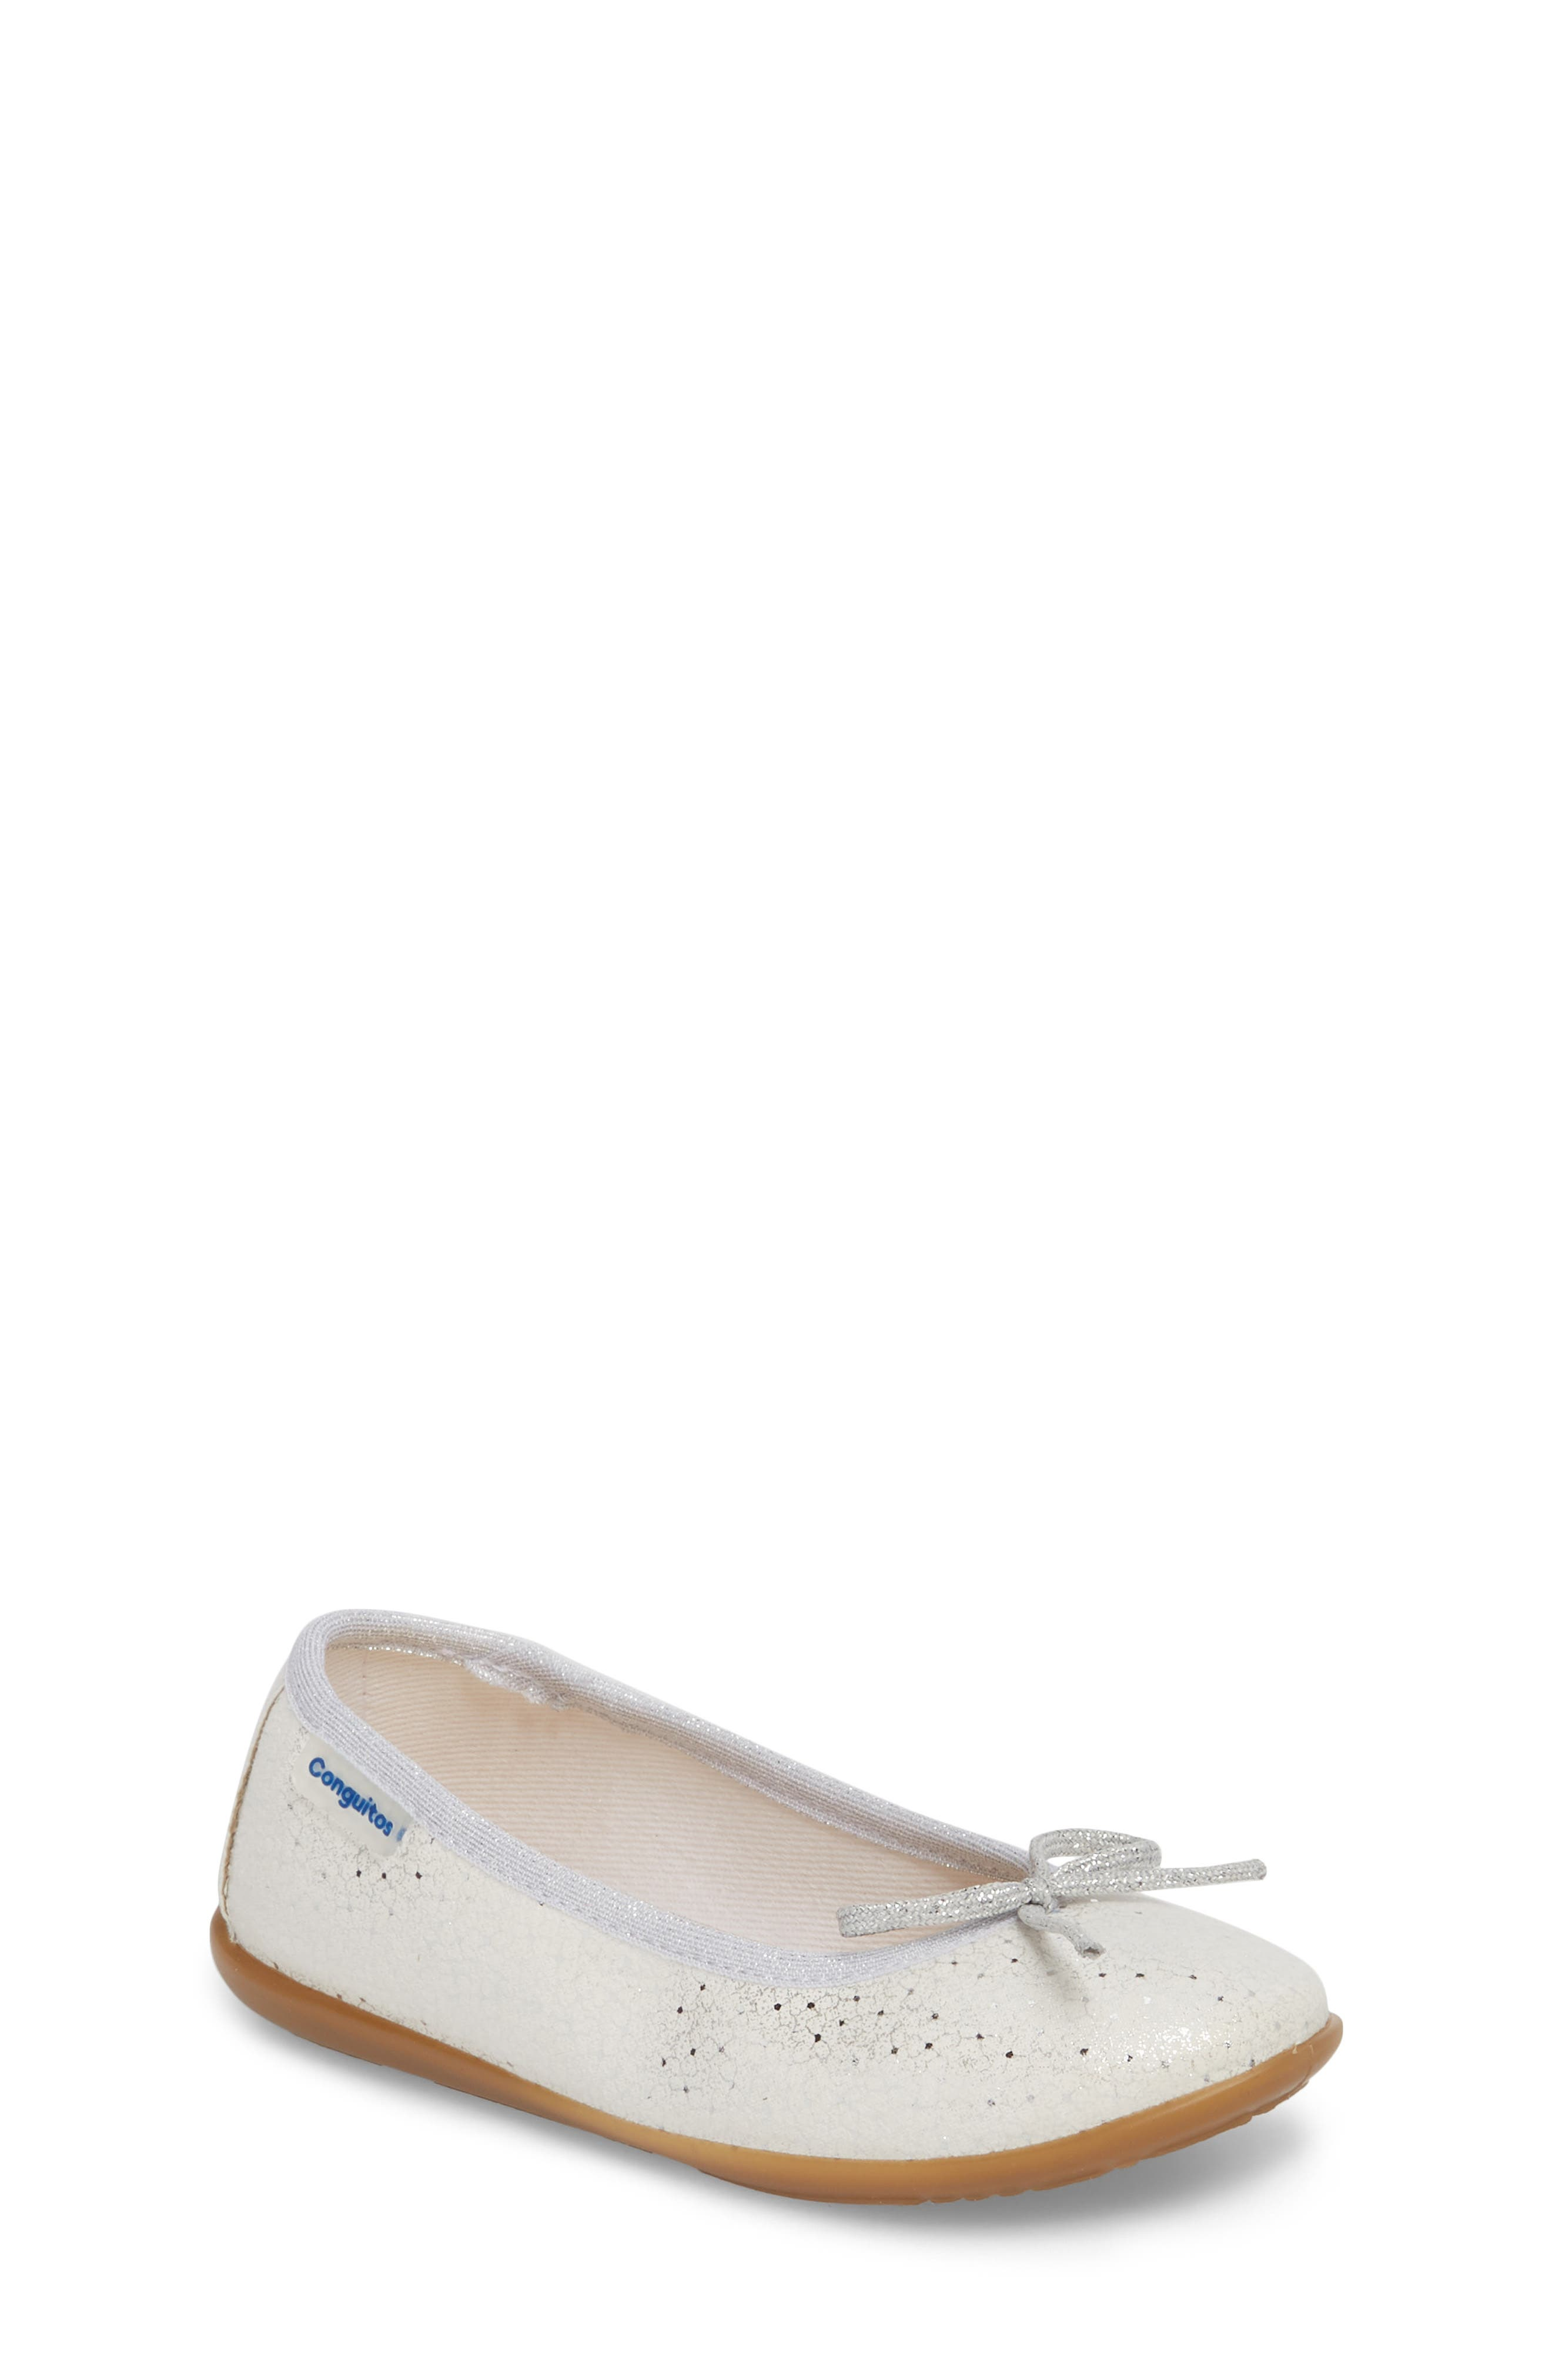 Aire Metallic Ballet Flat,                         Main,                         color, SILVER